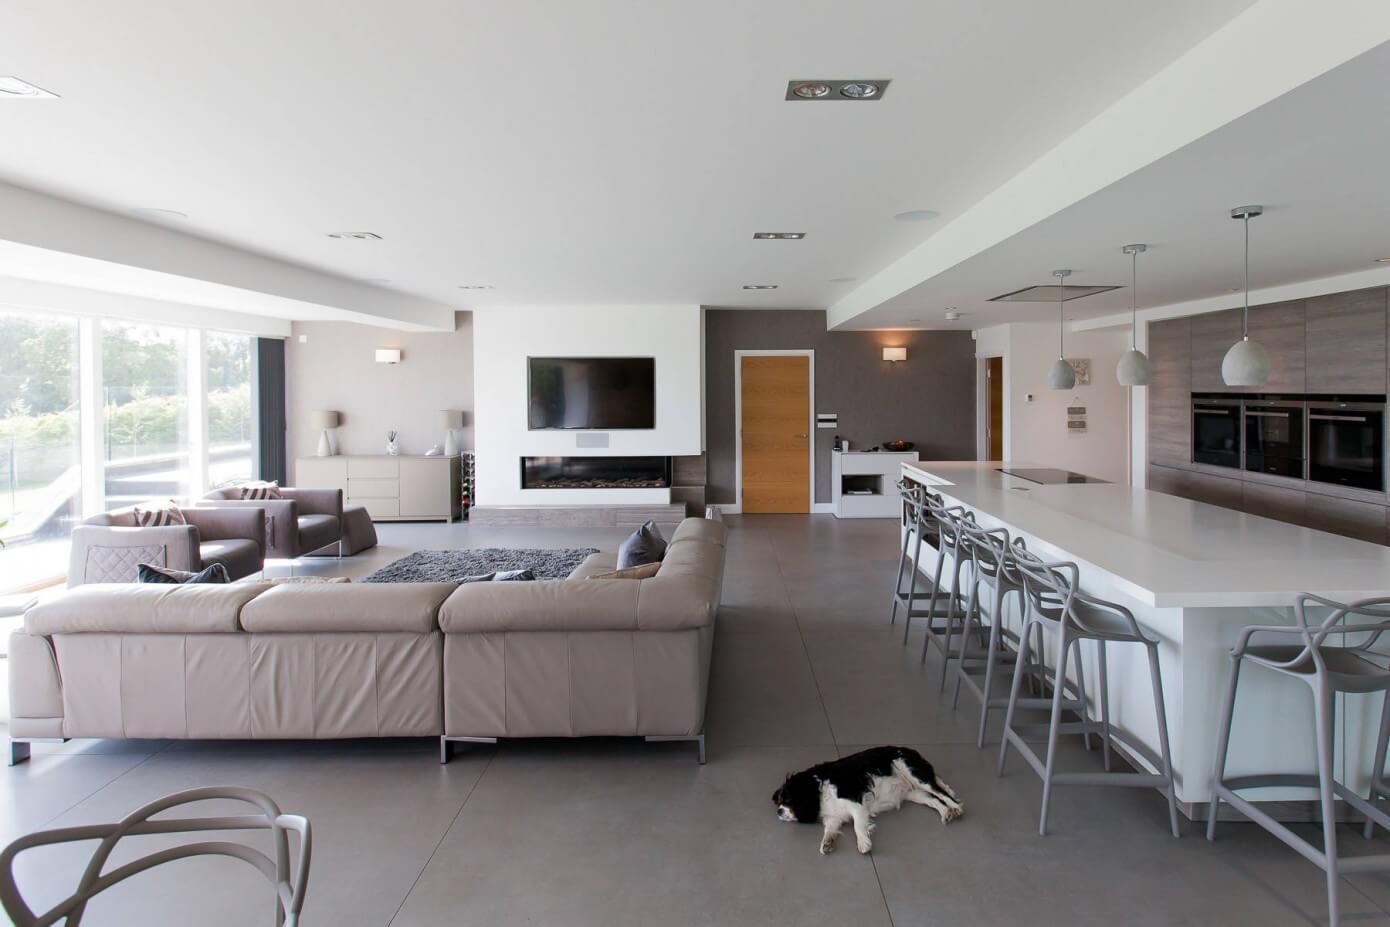 Layton Croft by CRL Architects